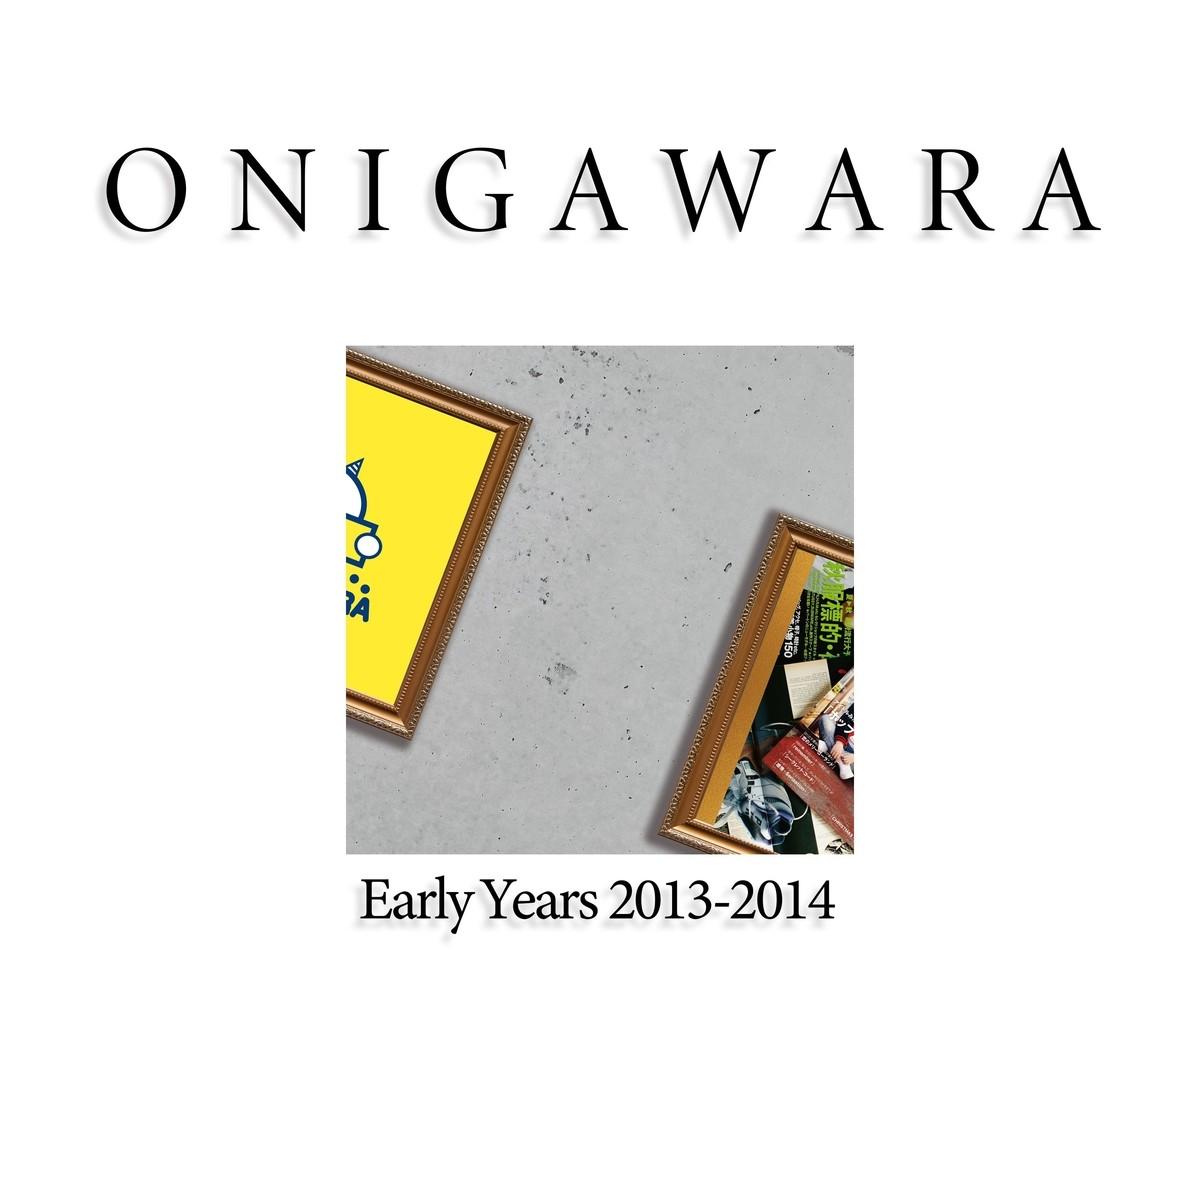 ONIGAWARA – ONIGAWARA EARLY YEARS 2013~2014 [FLAC + MP3 320 / WEB] [2020.09.23]